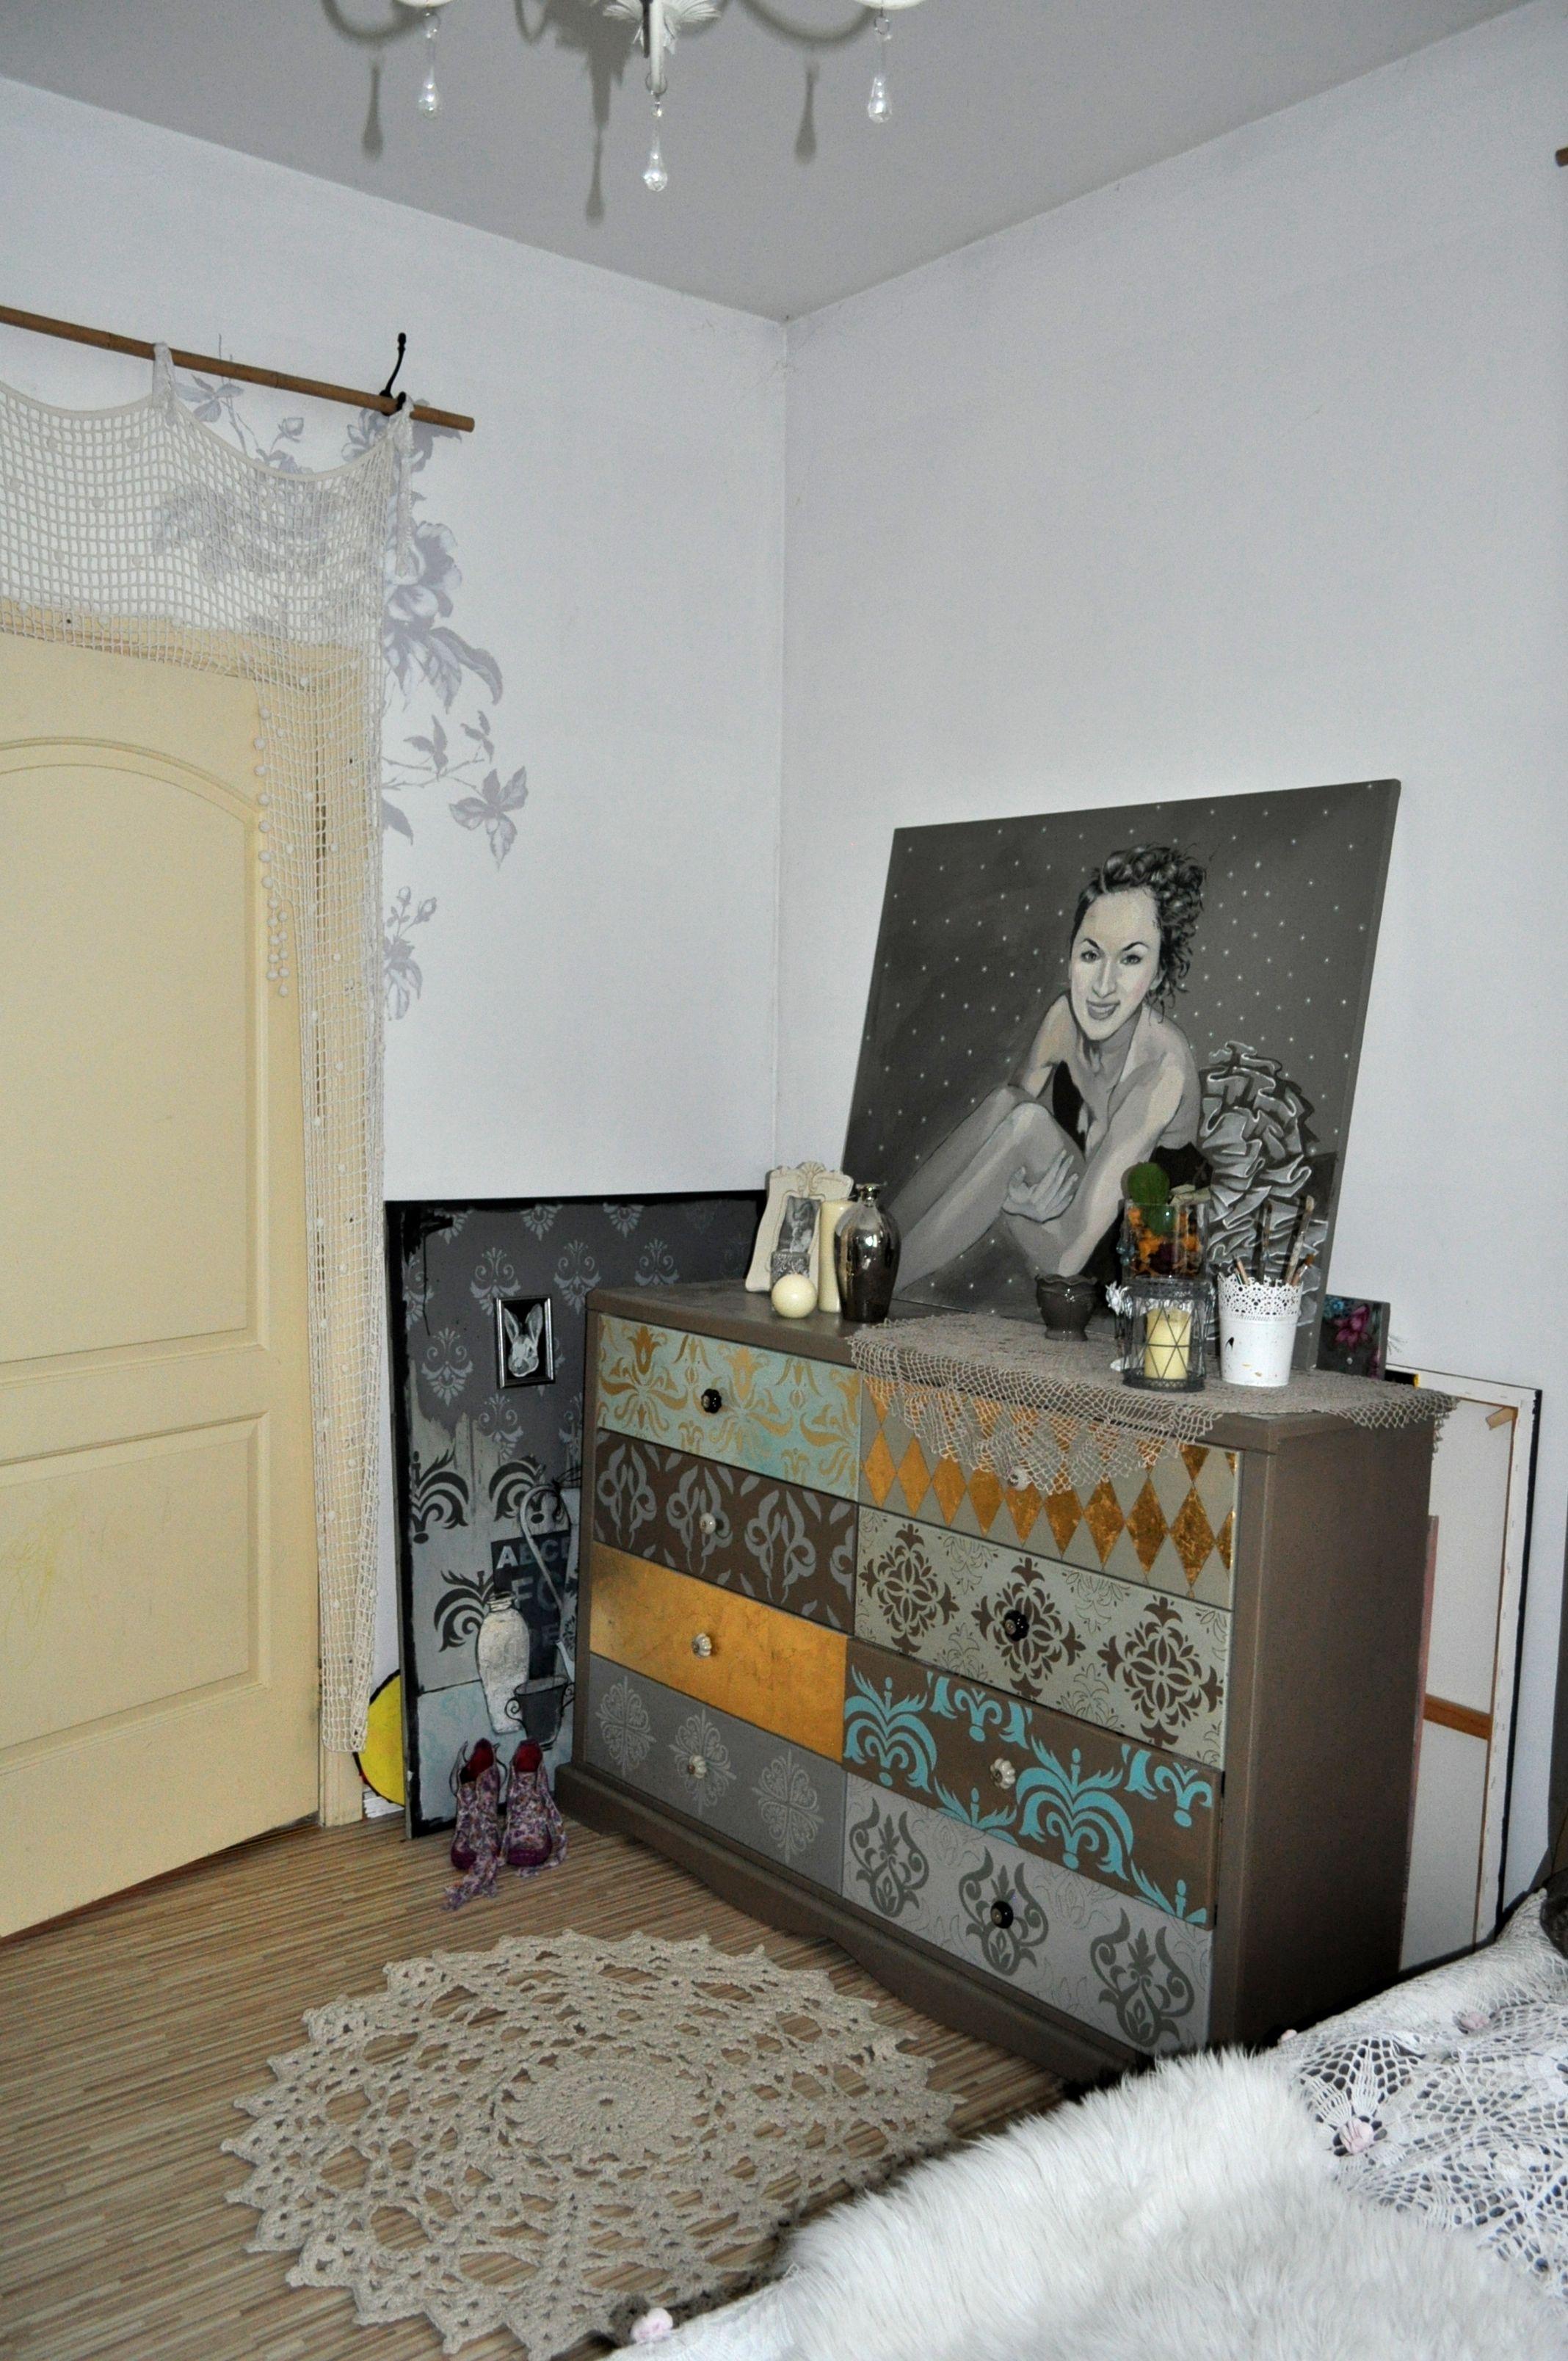 Painting in interior By Ilze krastiņa